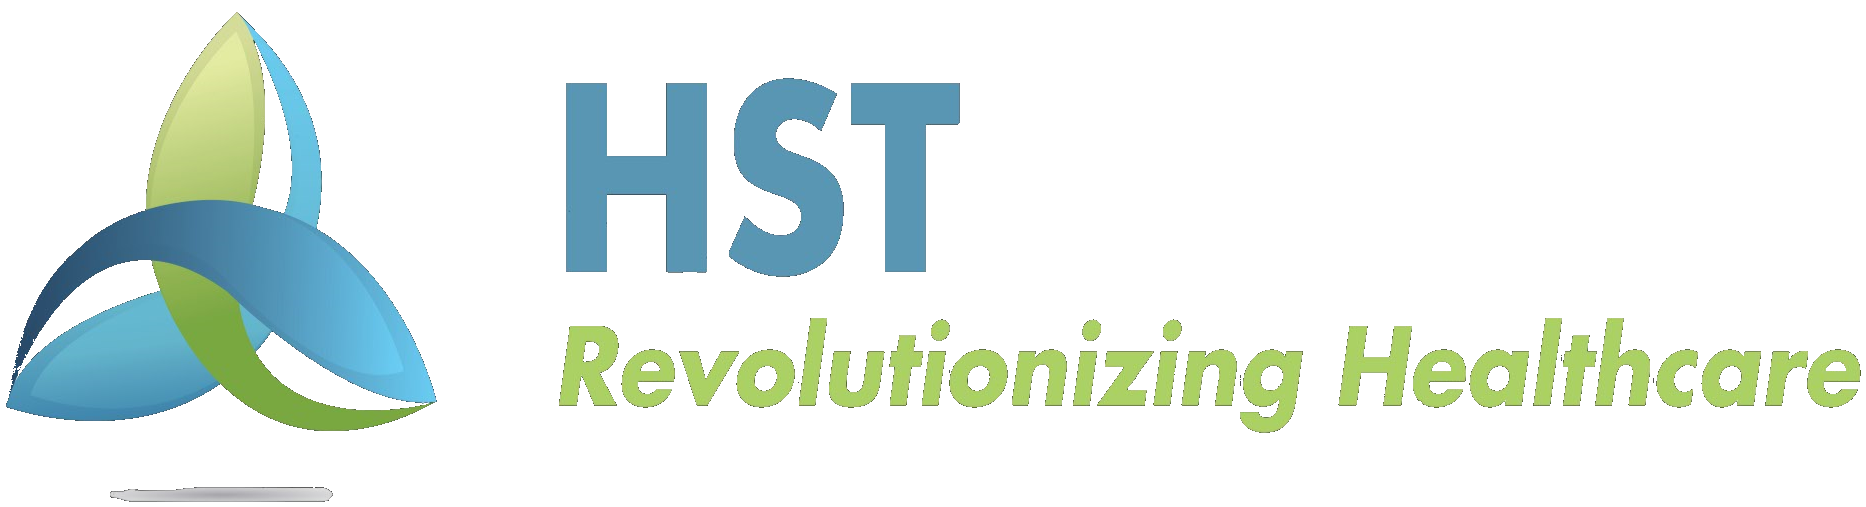 HST logotransparentsmall2